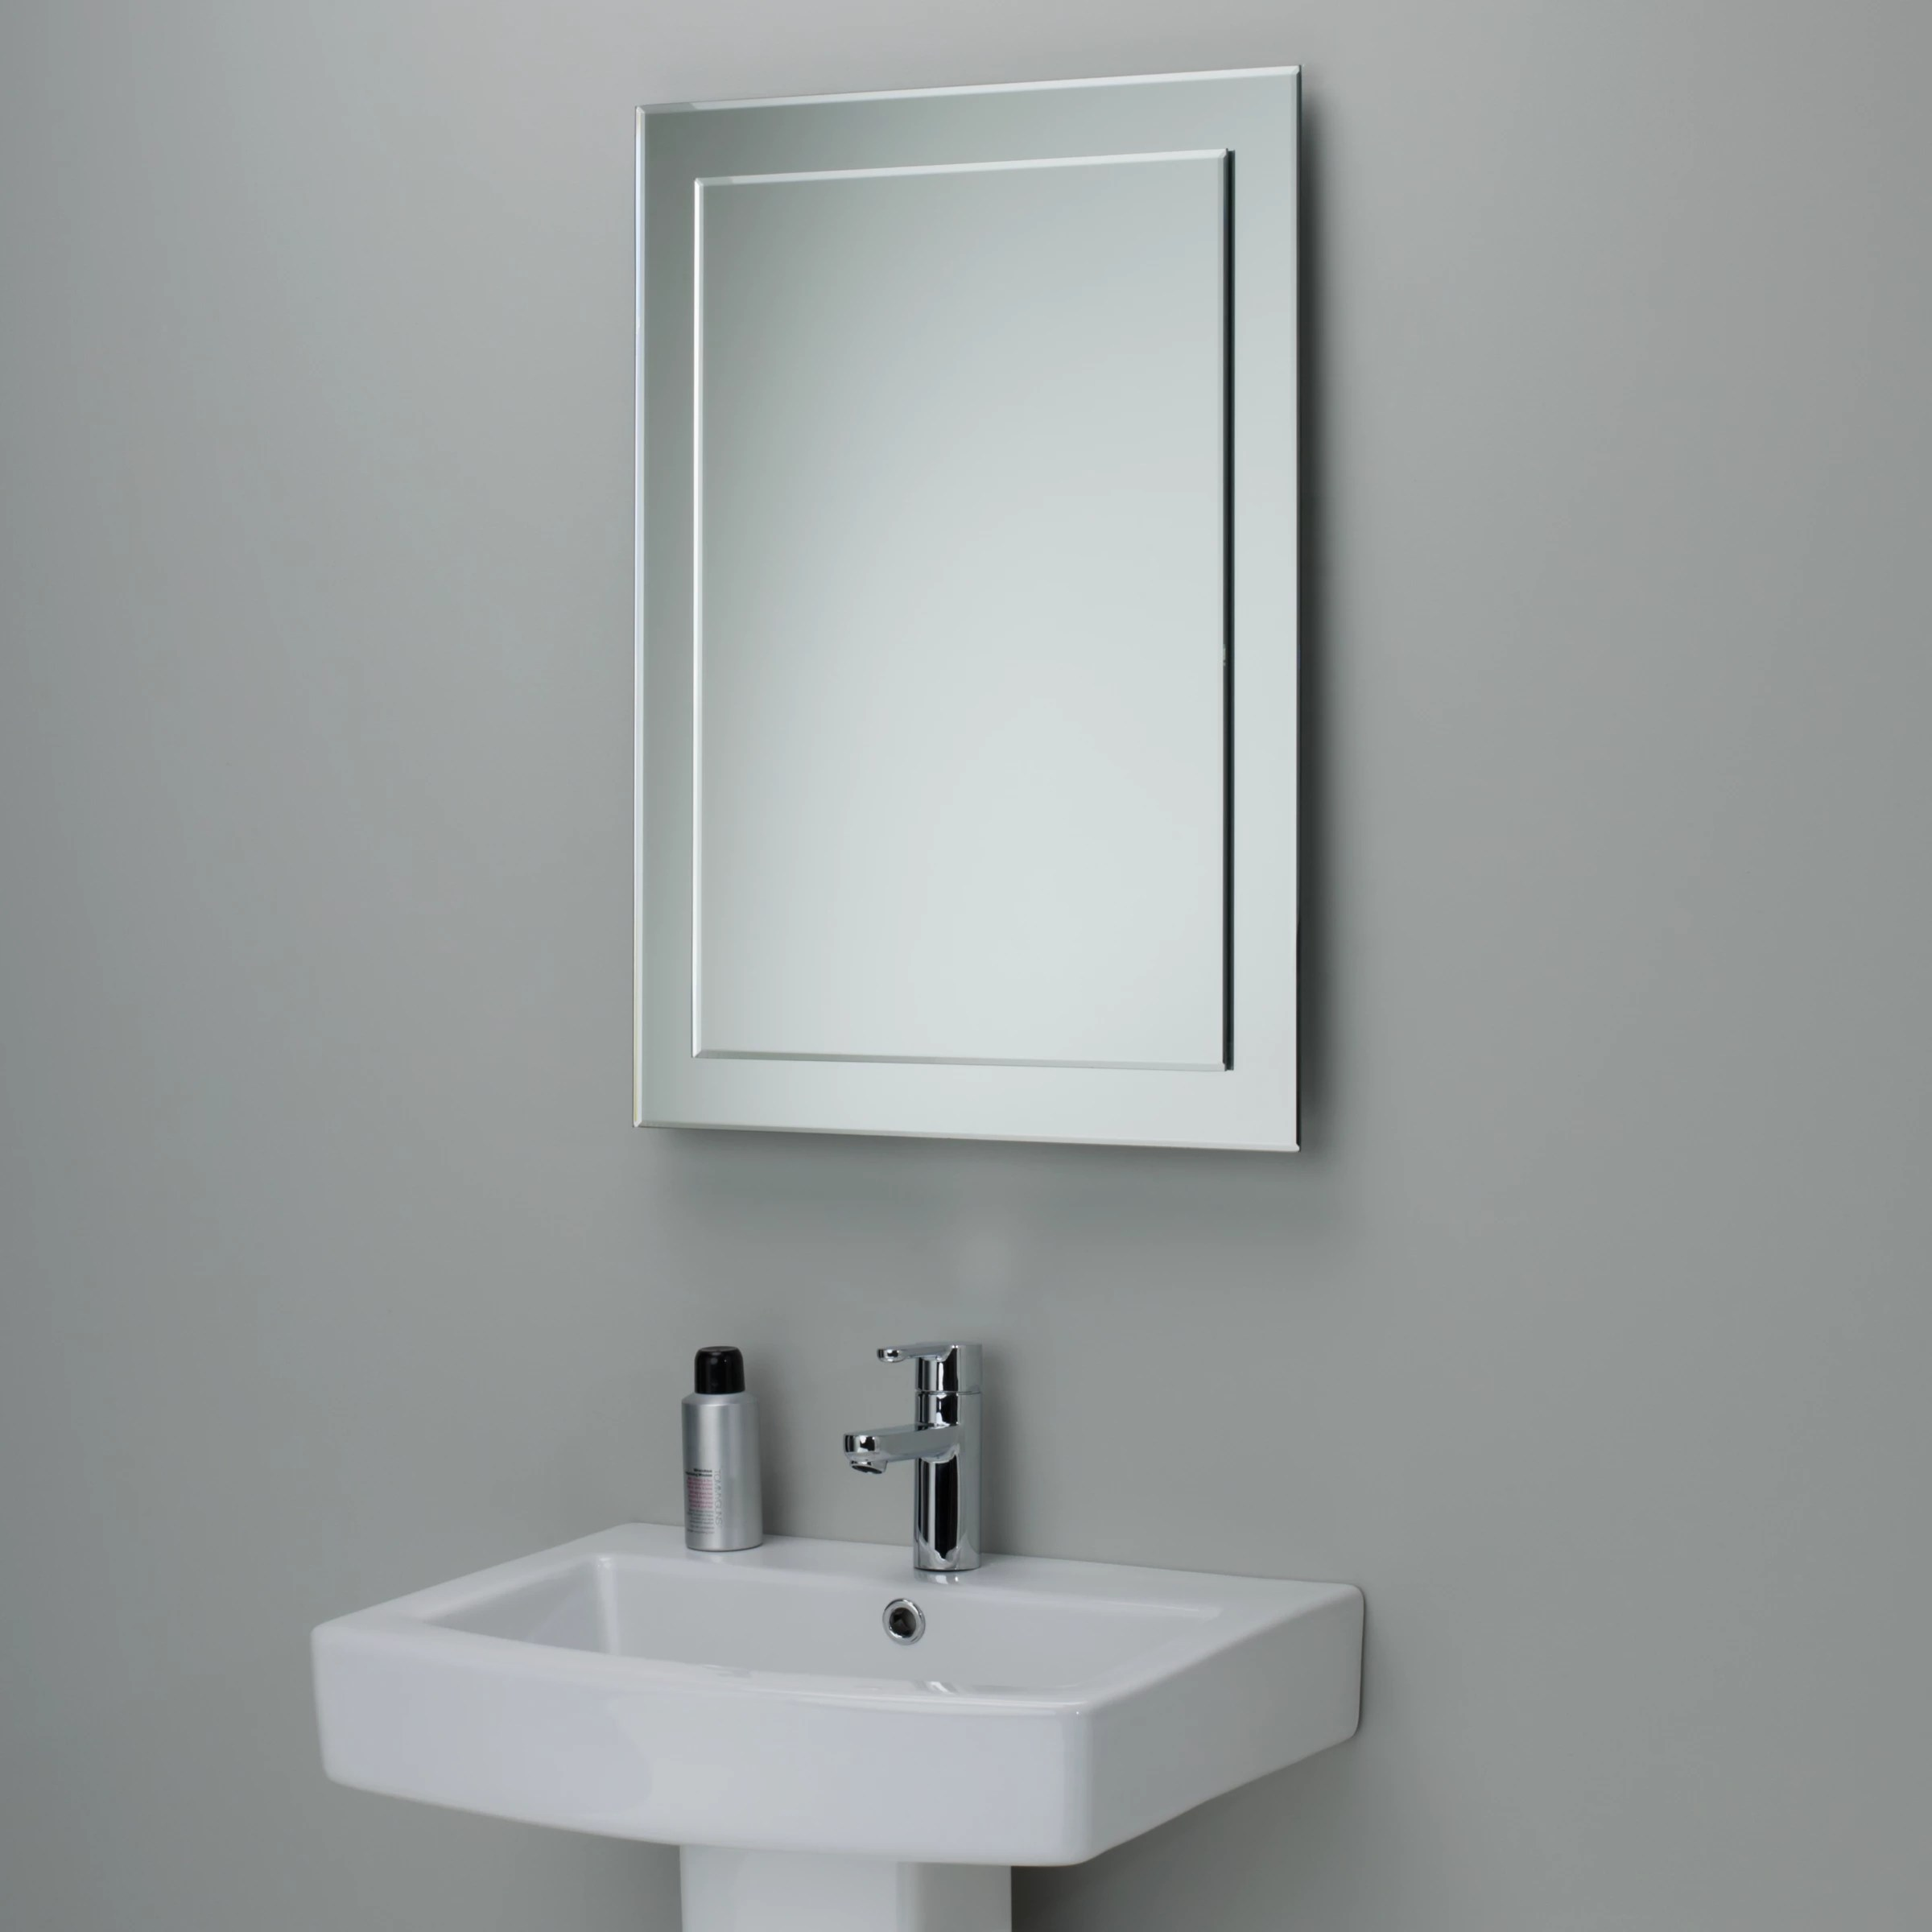 John Lewis Duo Wall Bathroom Mirror 70 x 50cm at John Lewis